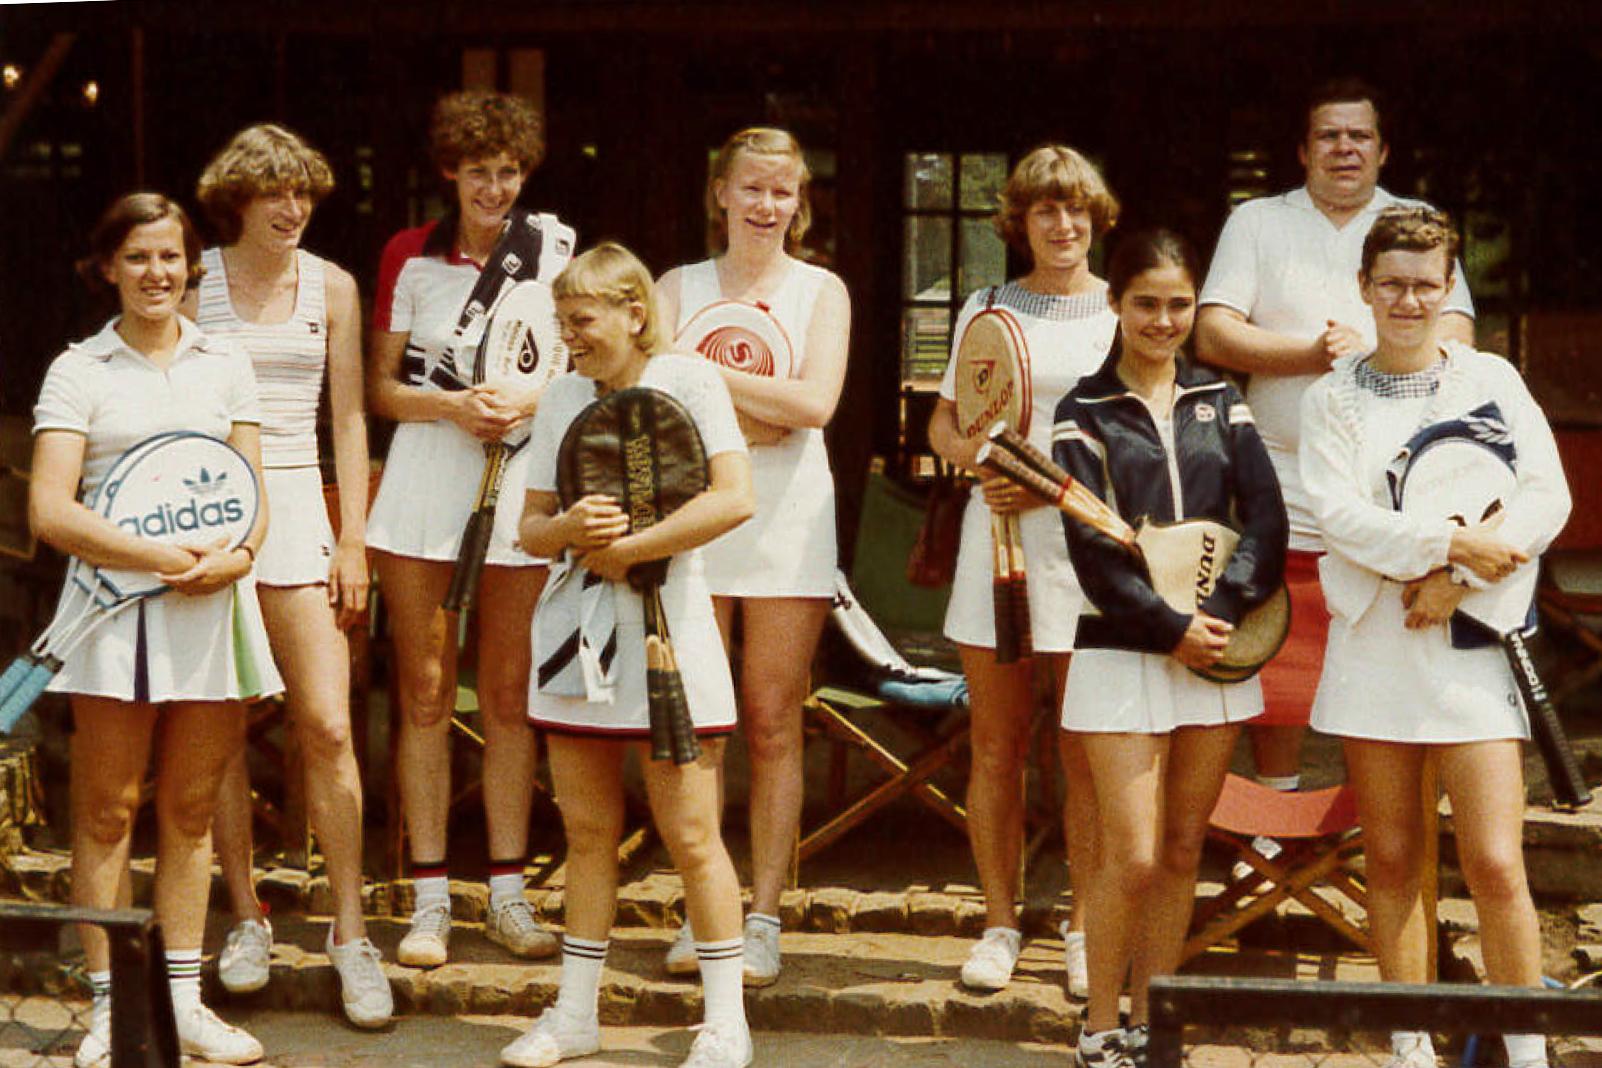 1972 kampioen van Belgie afd 1